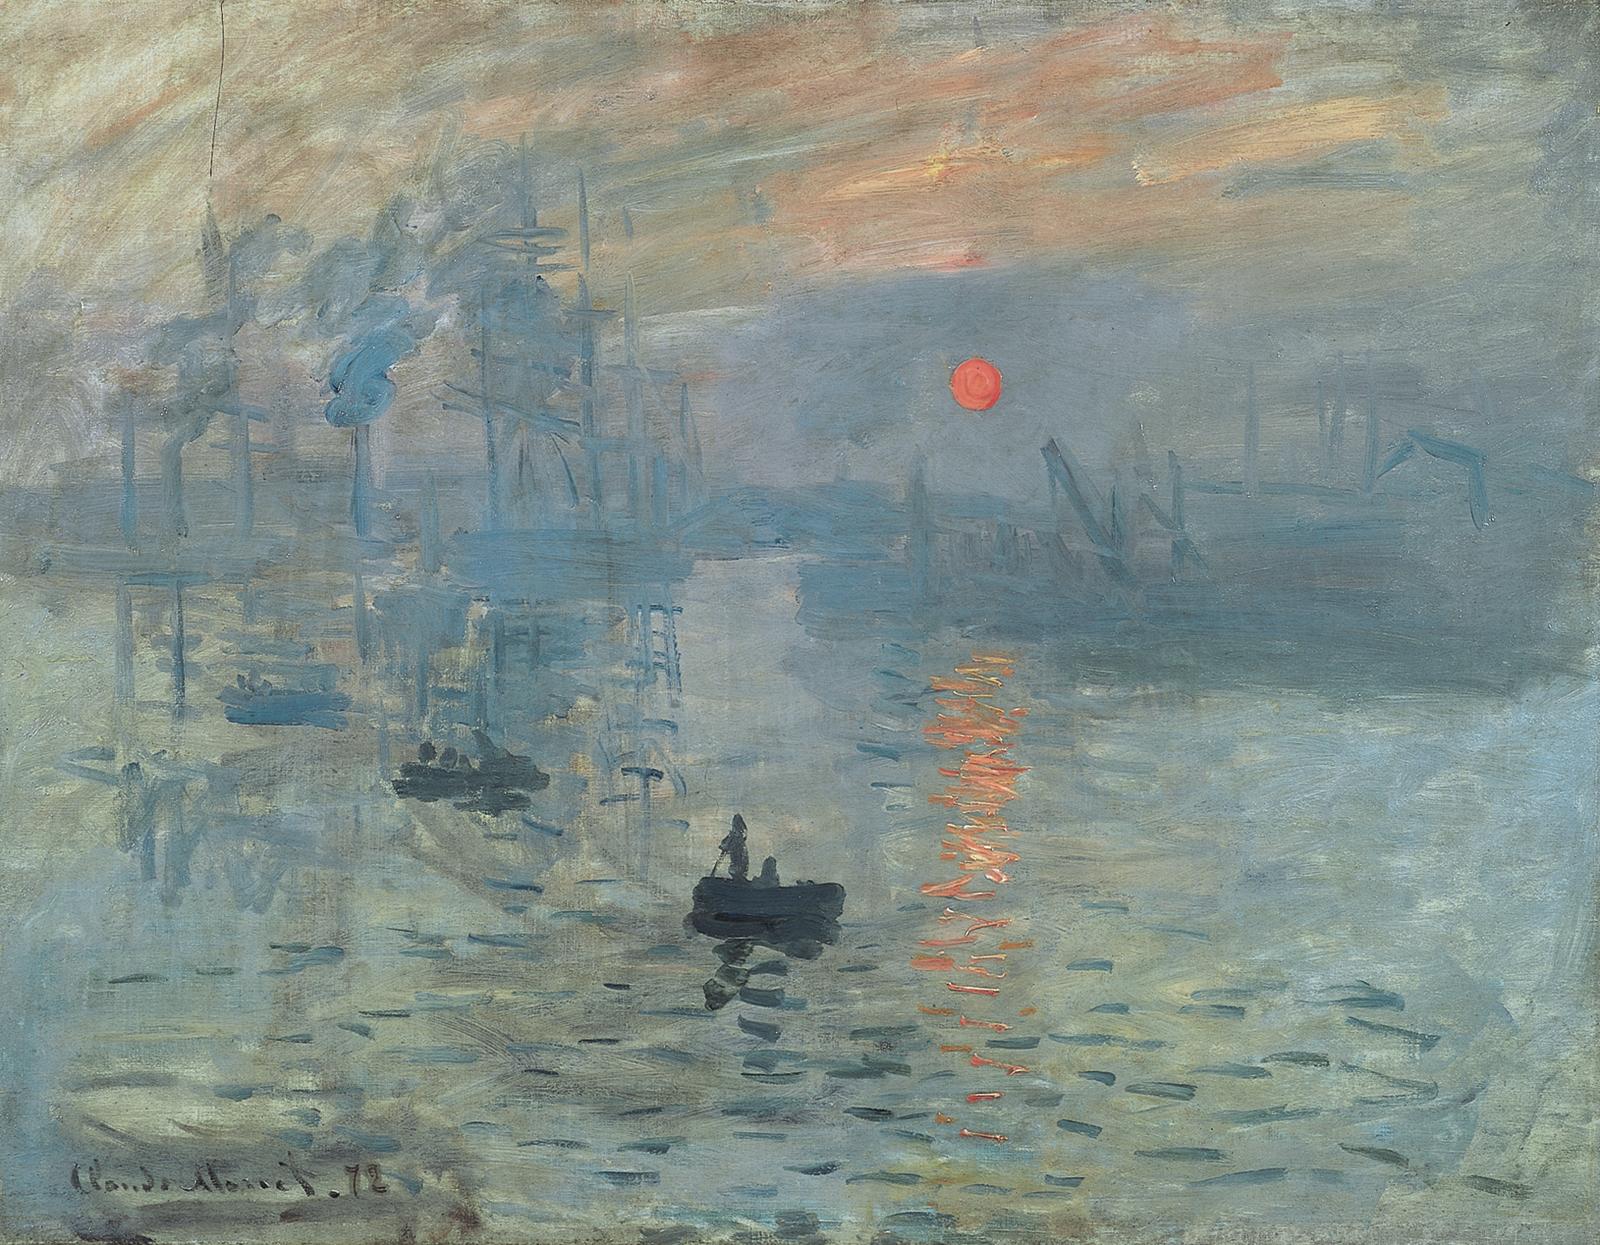 Claude Monet, Impression Sunrise, 1872, Musee Marmottan